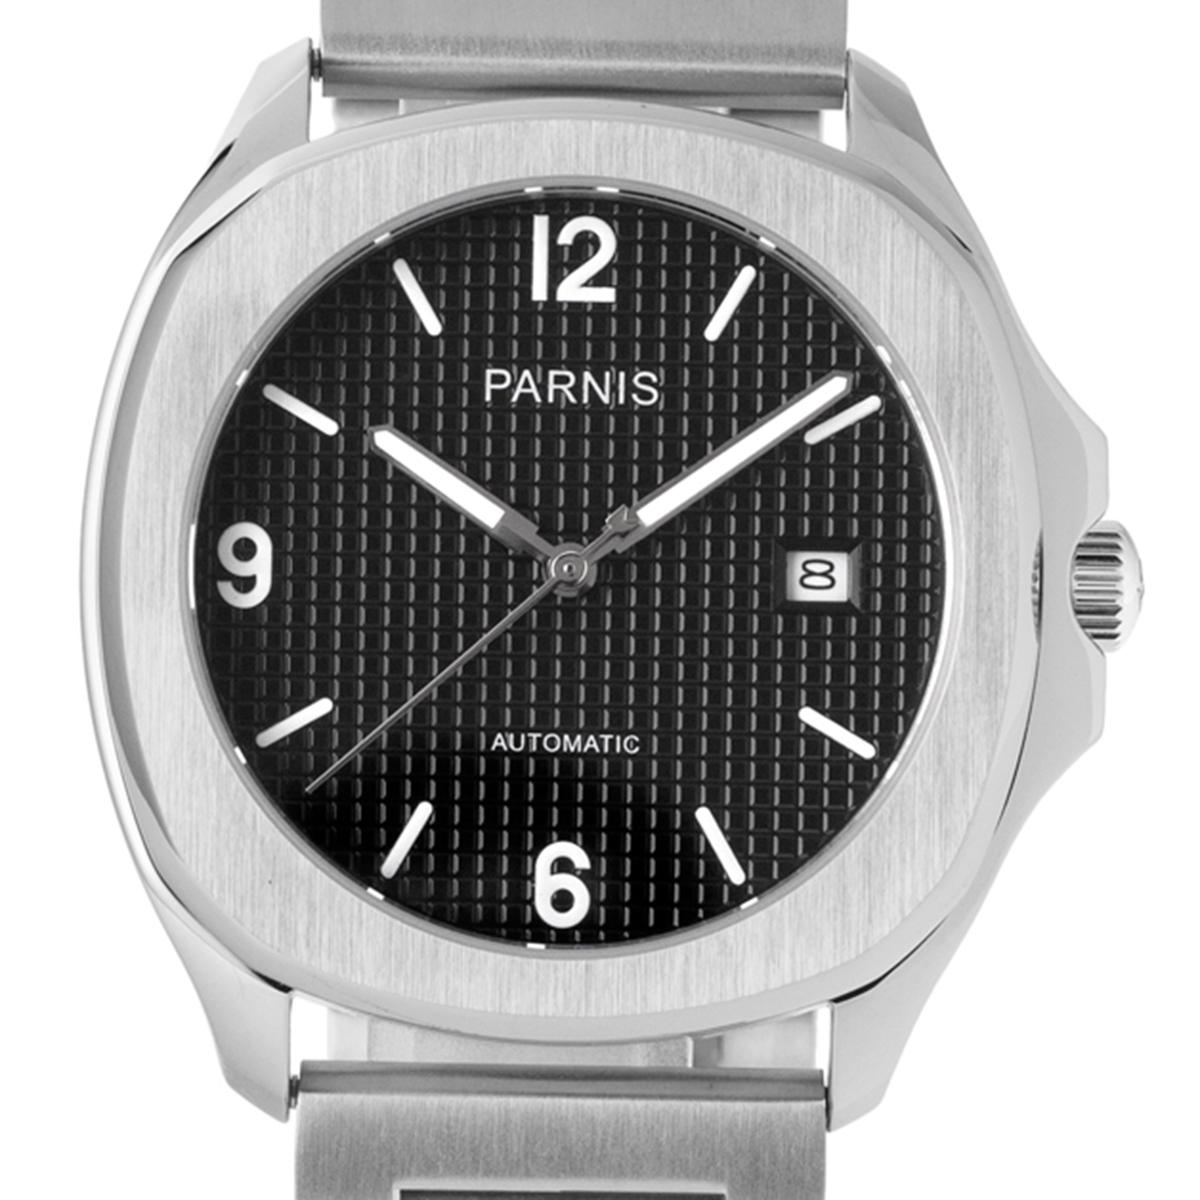 PARNIS パーニス 自動巻き(手巻き機能あり) 腕時計 [P6022-SB-A] 並行輸入品 カレンダー